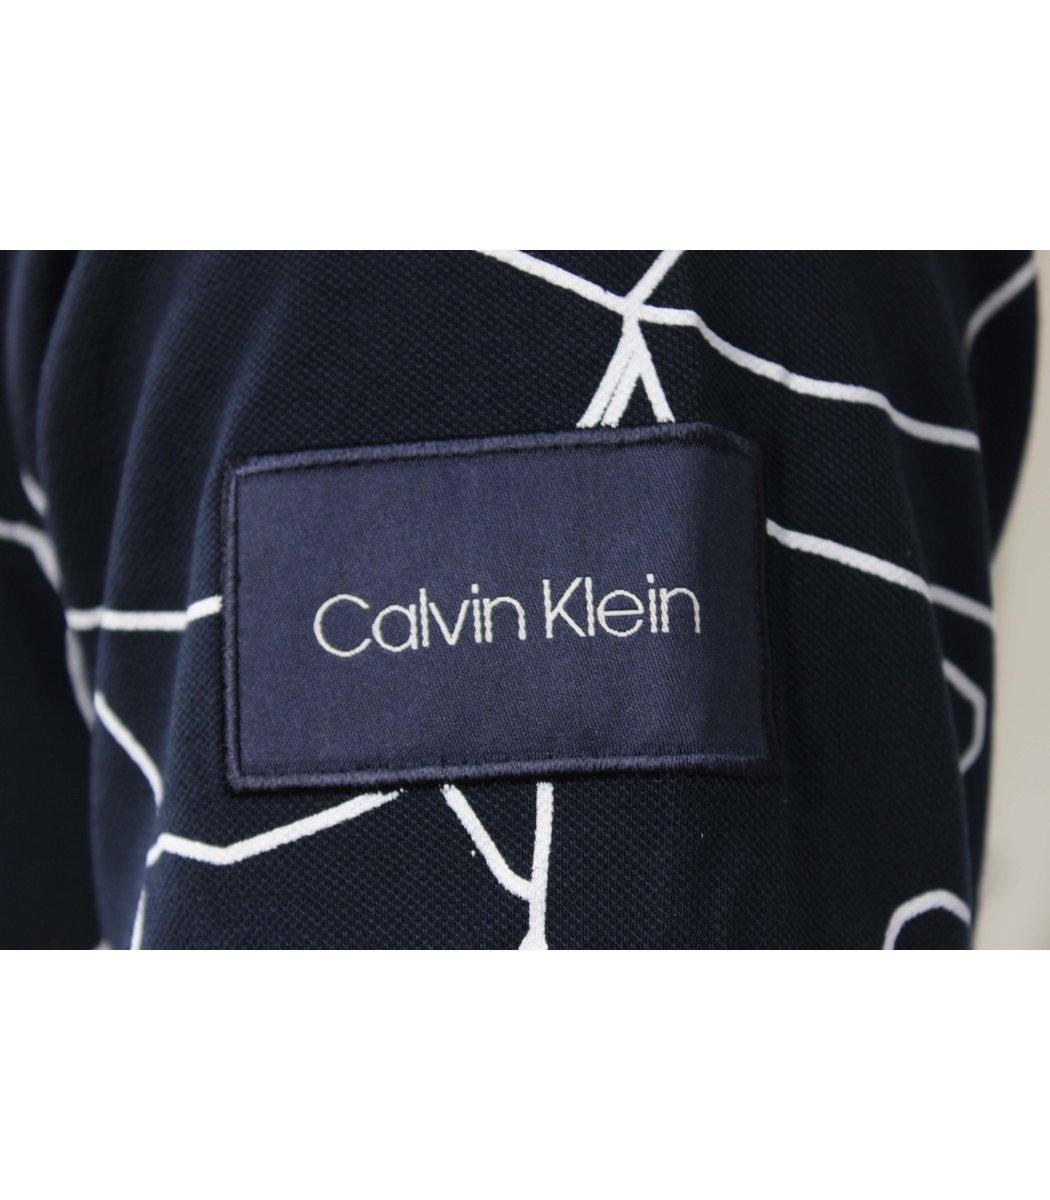 Темно синяя футболка поло Calvin Klein MCK2